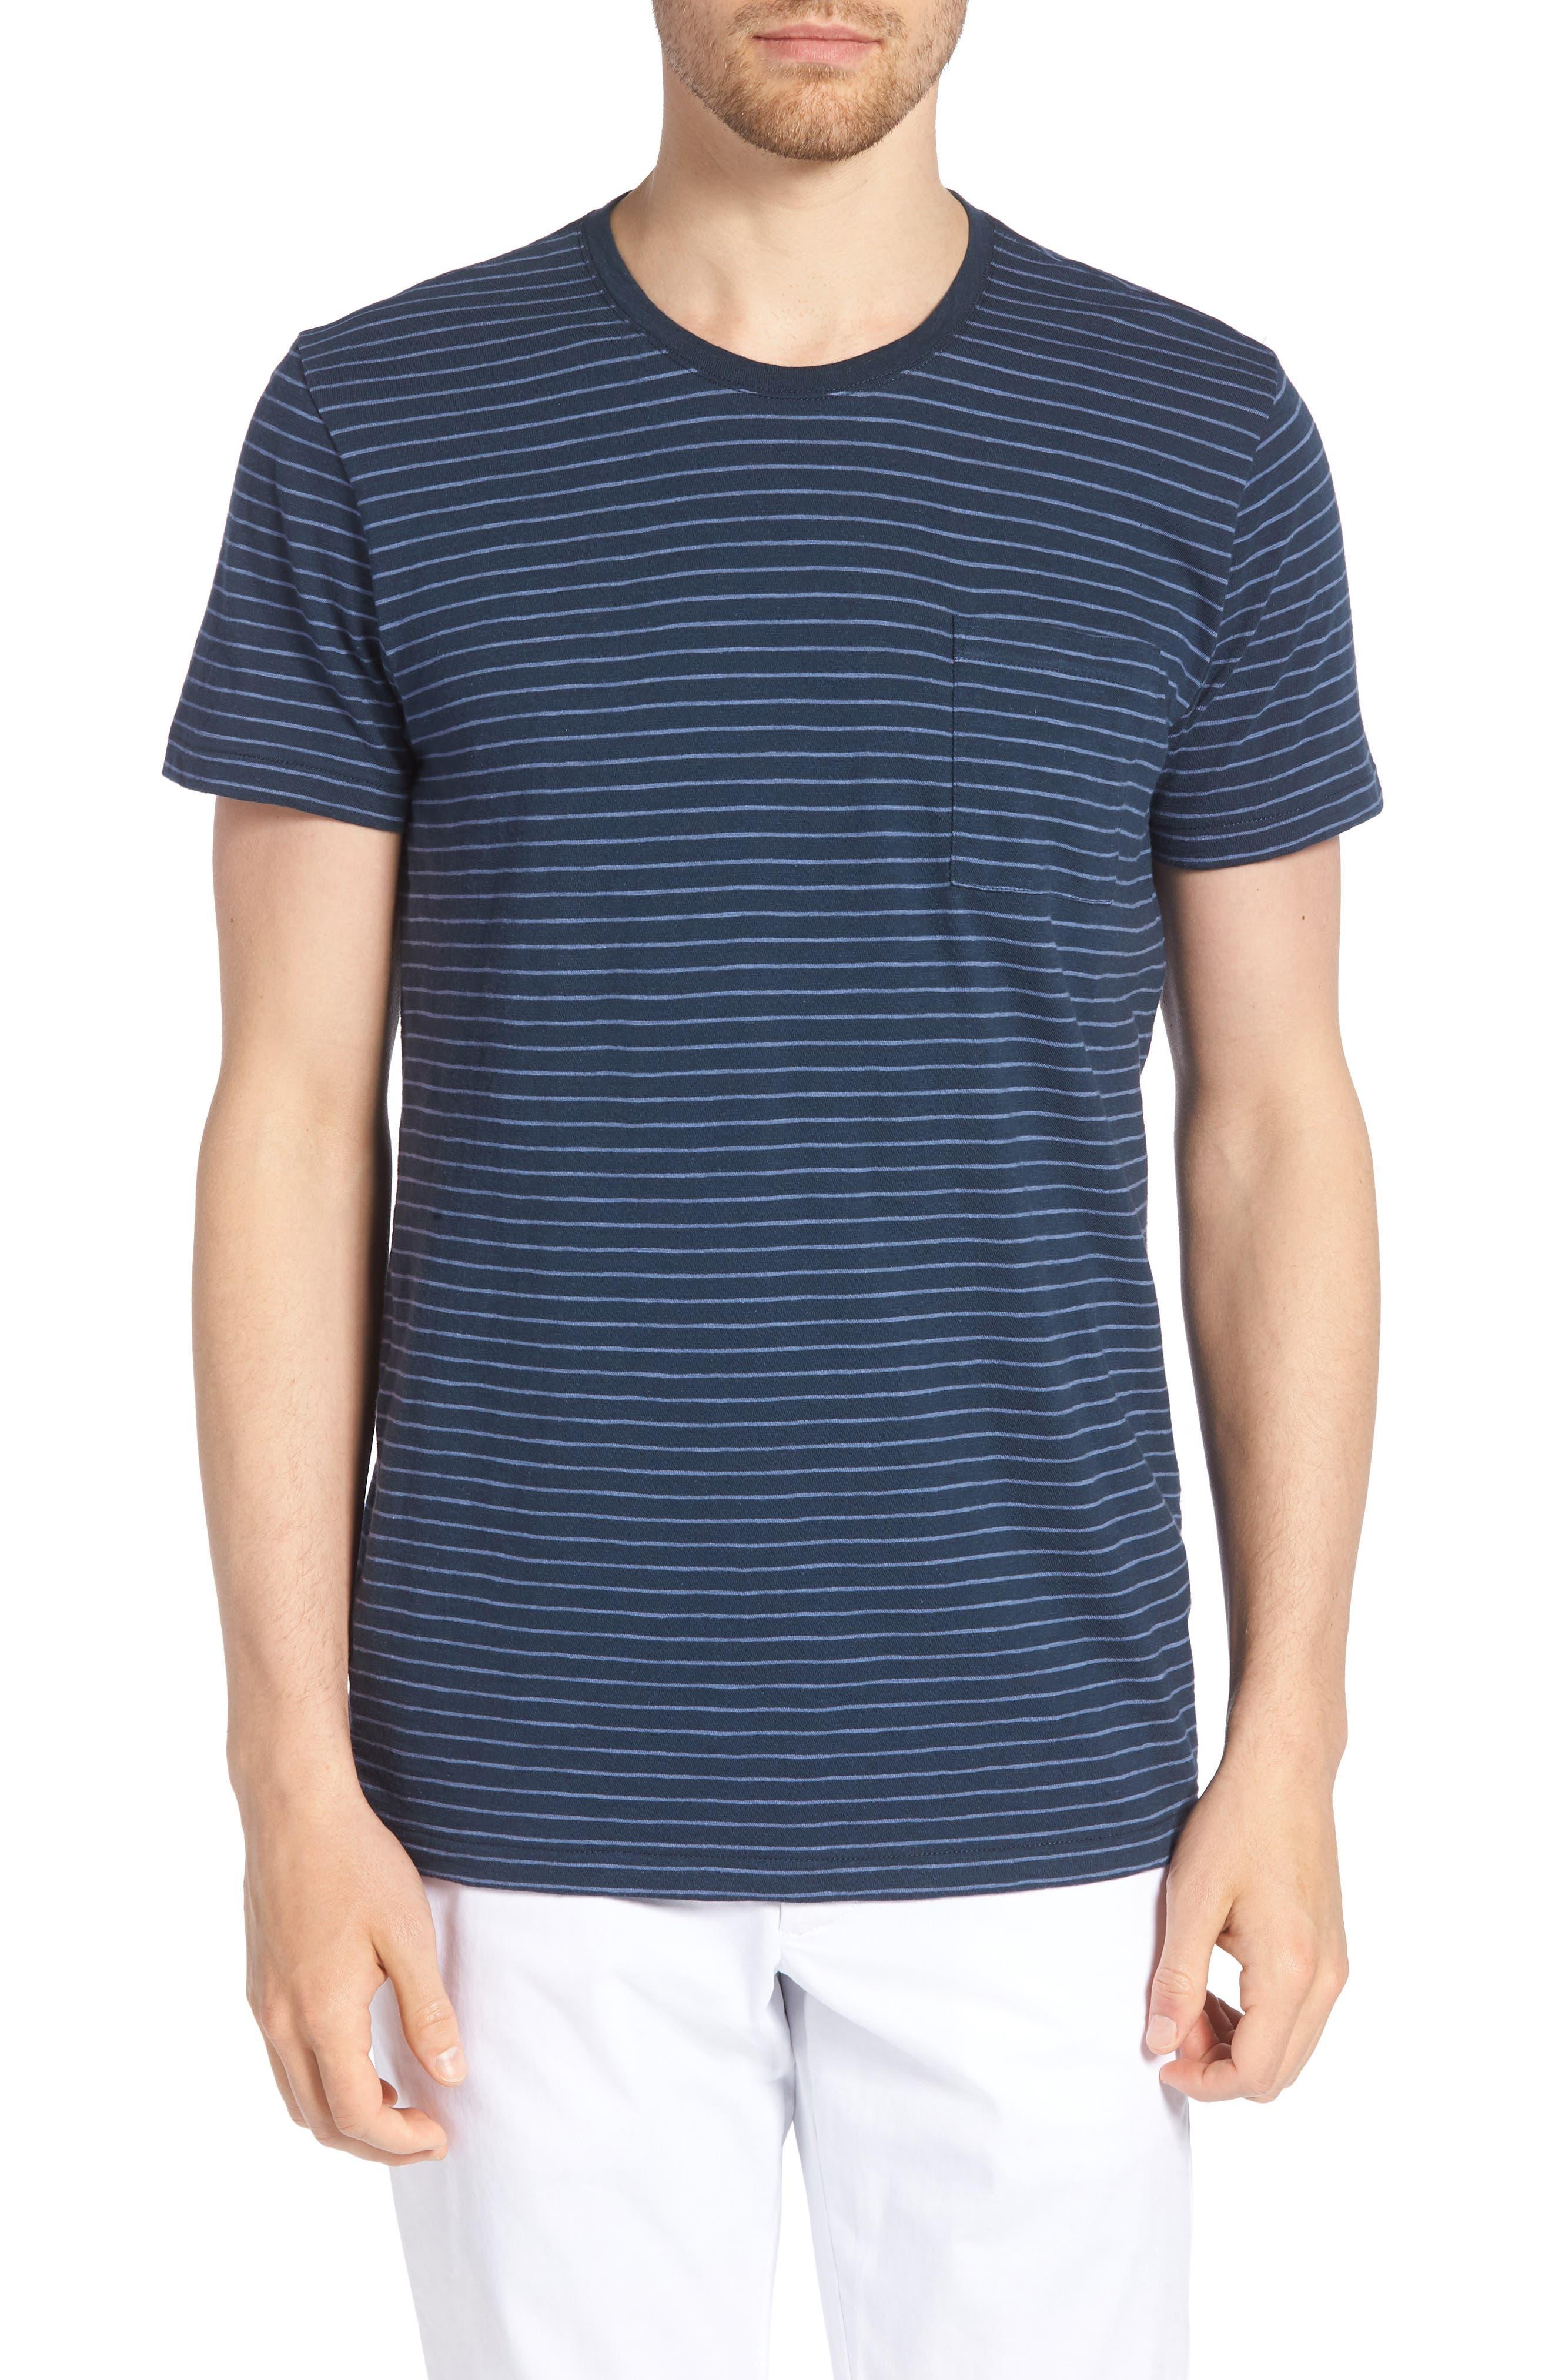 Stripe Slim Fit Pocket T-Shirt,                             Main thumbnail 1, color,                             French Navy/ White